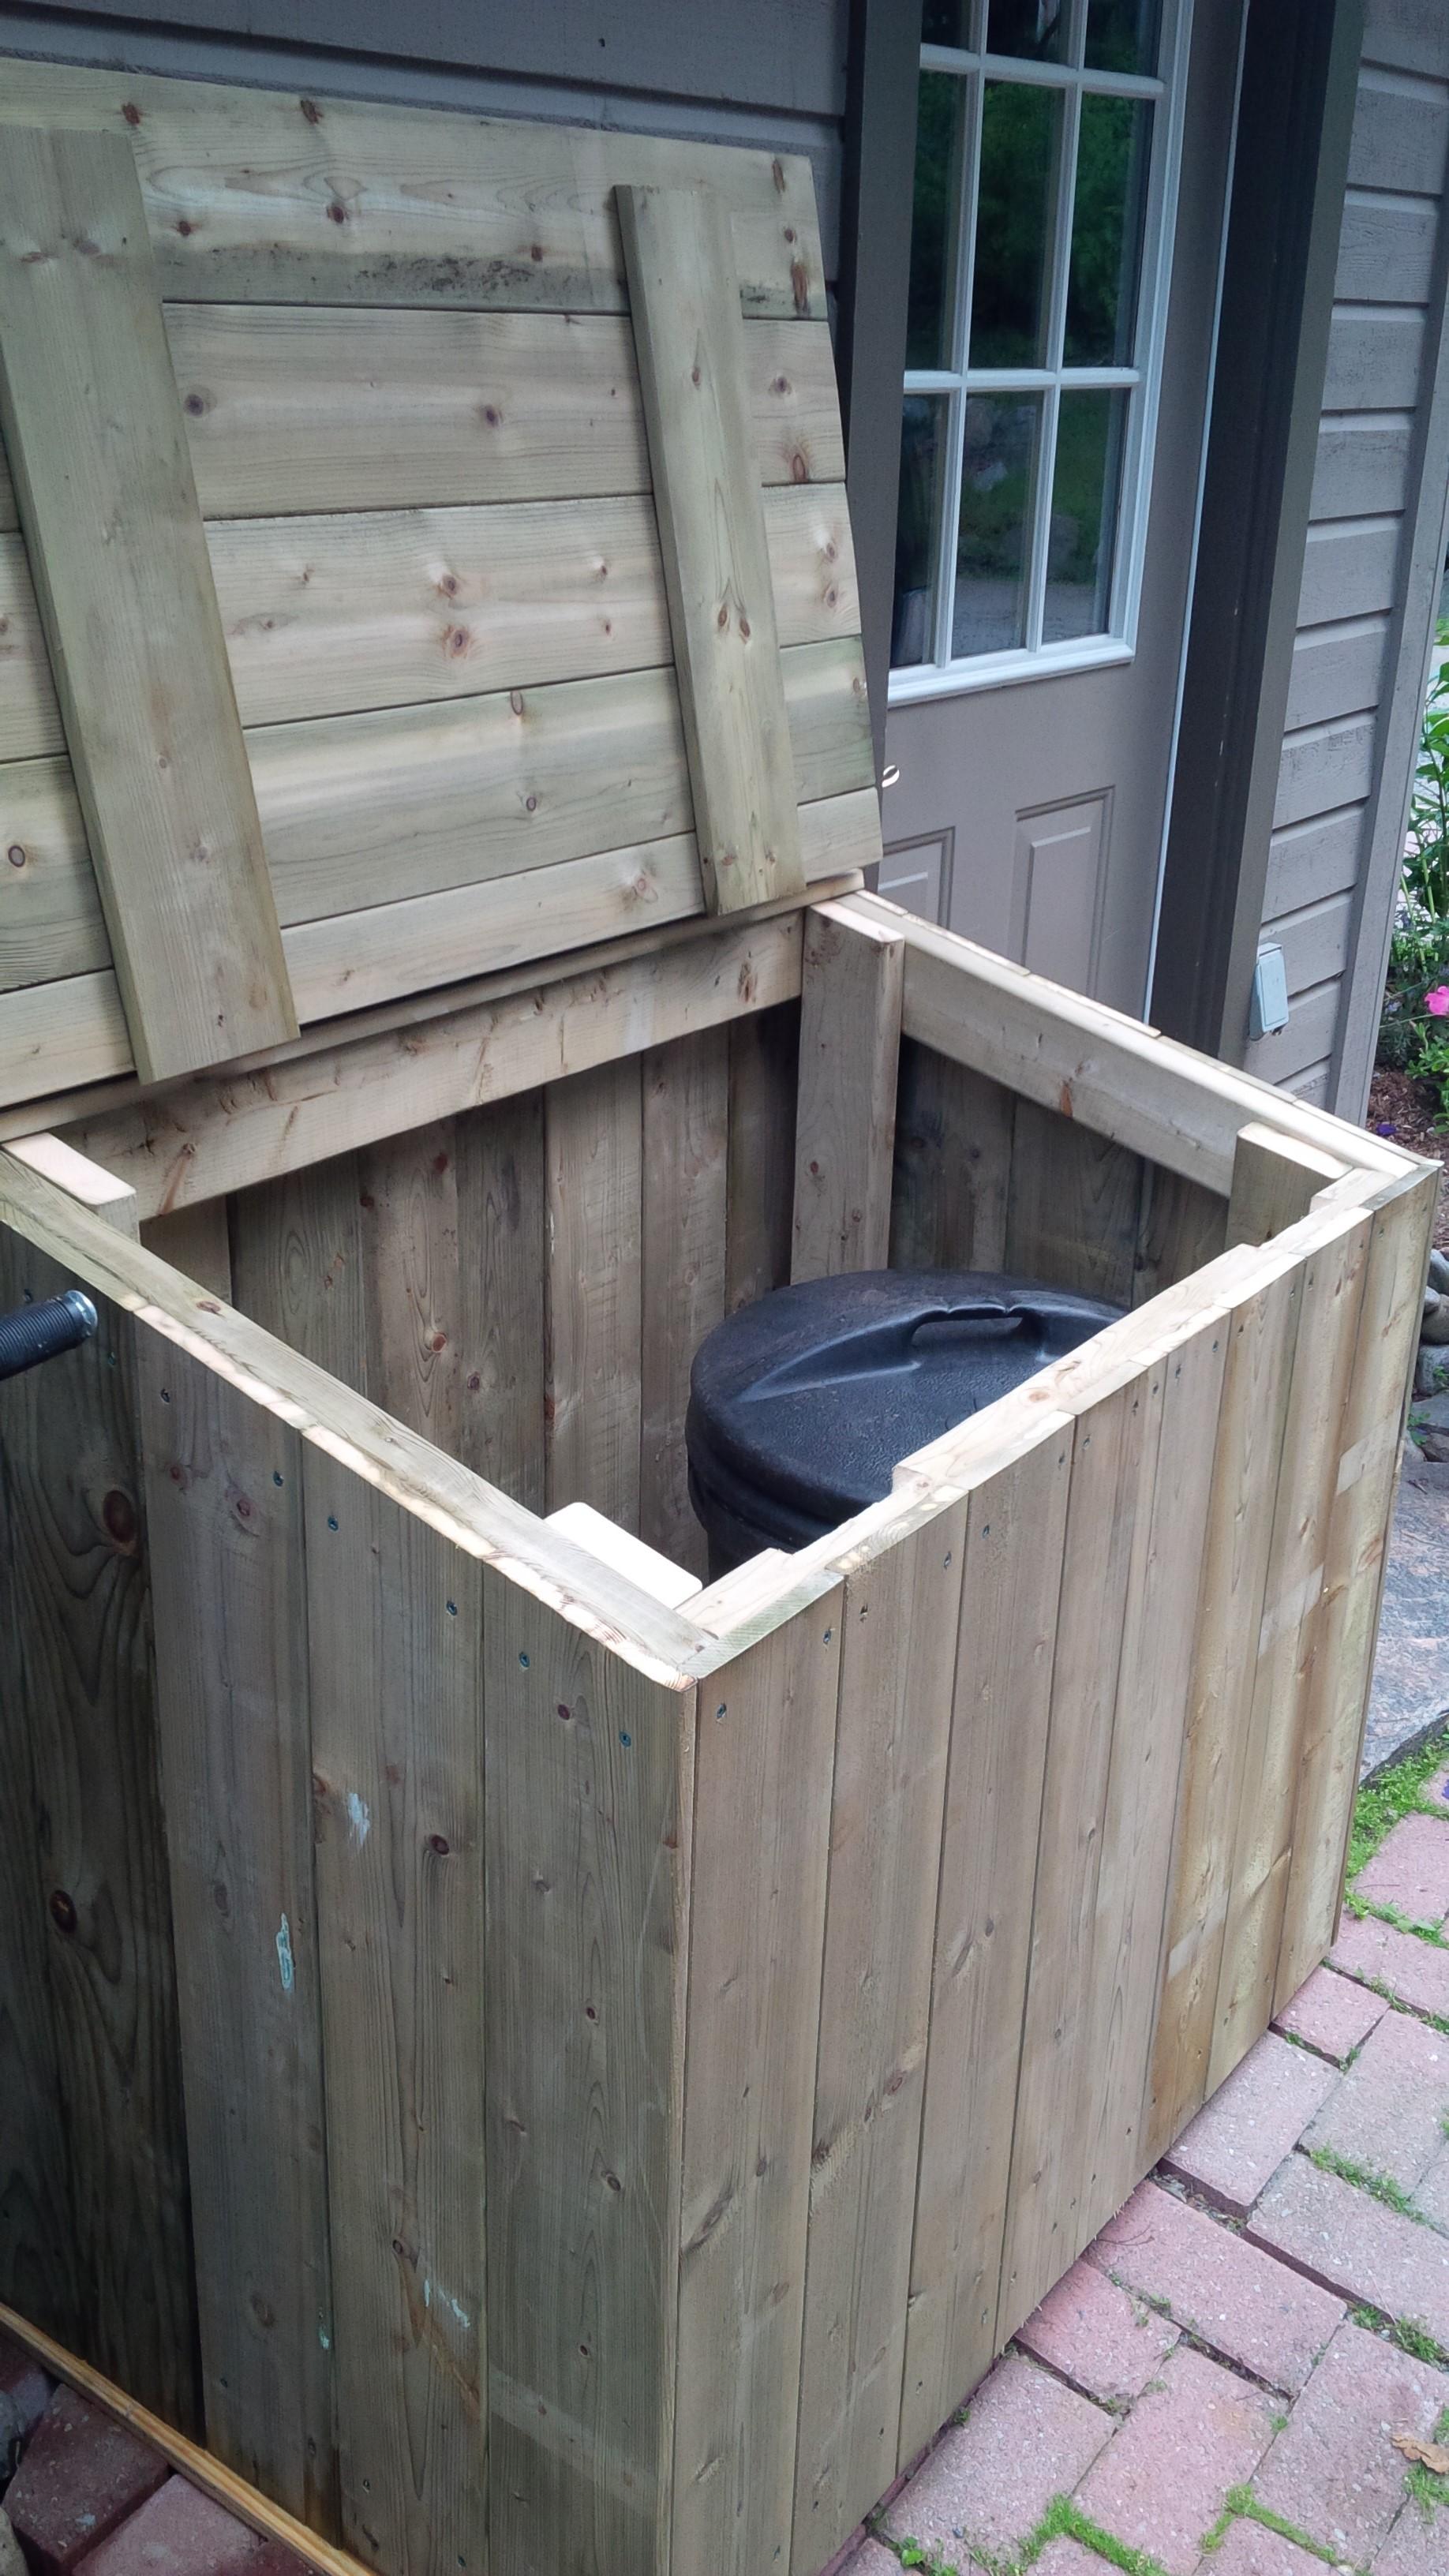 Mom's new Garbage Bin